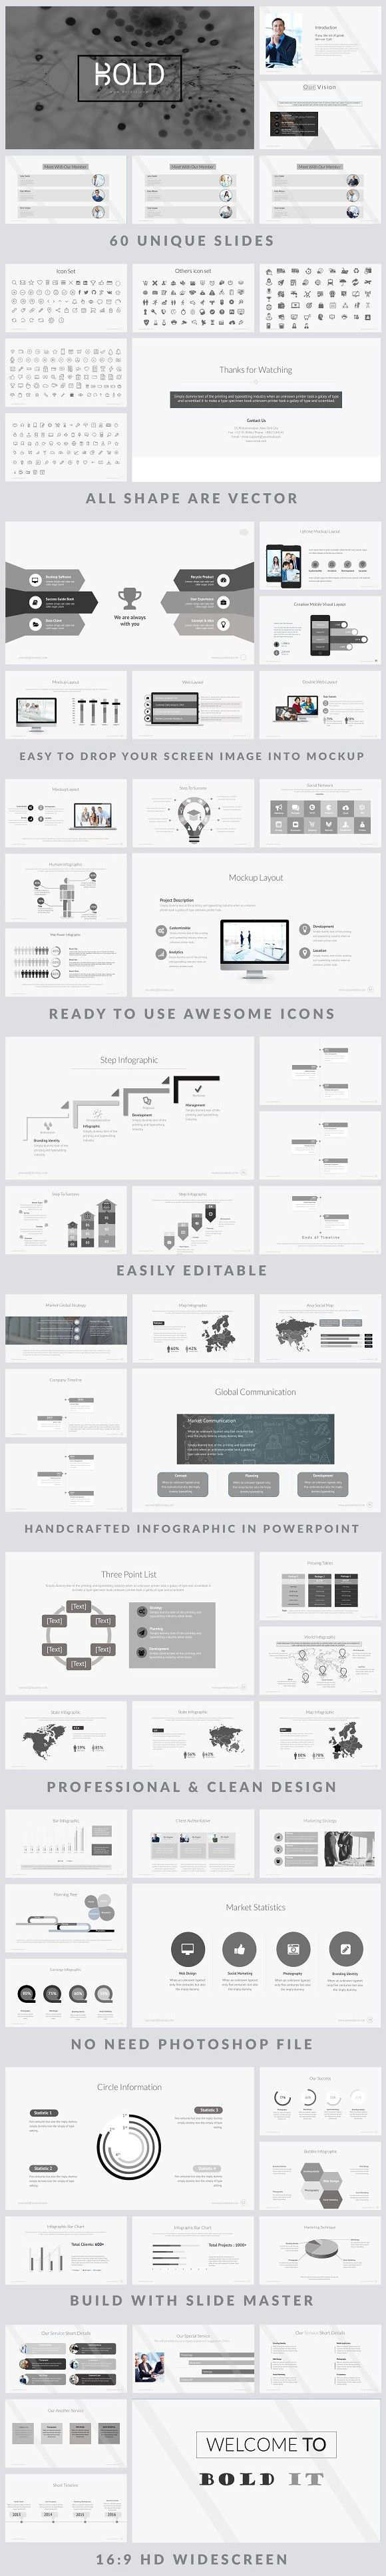 medical infographic bold powerpoint presentation presentation